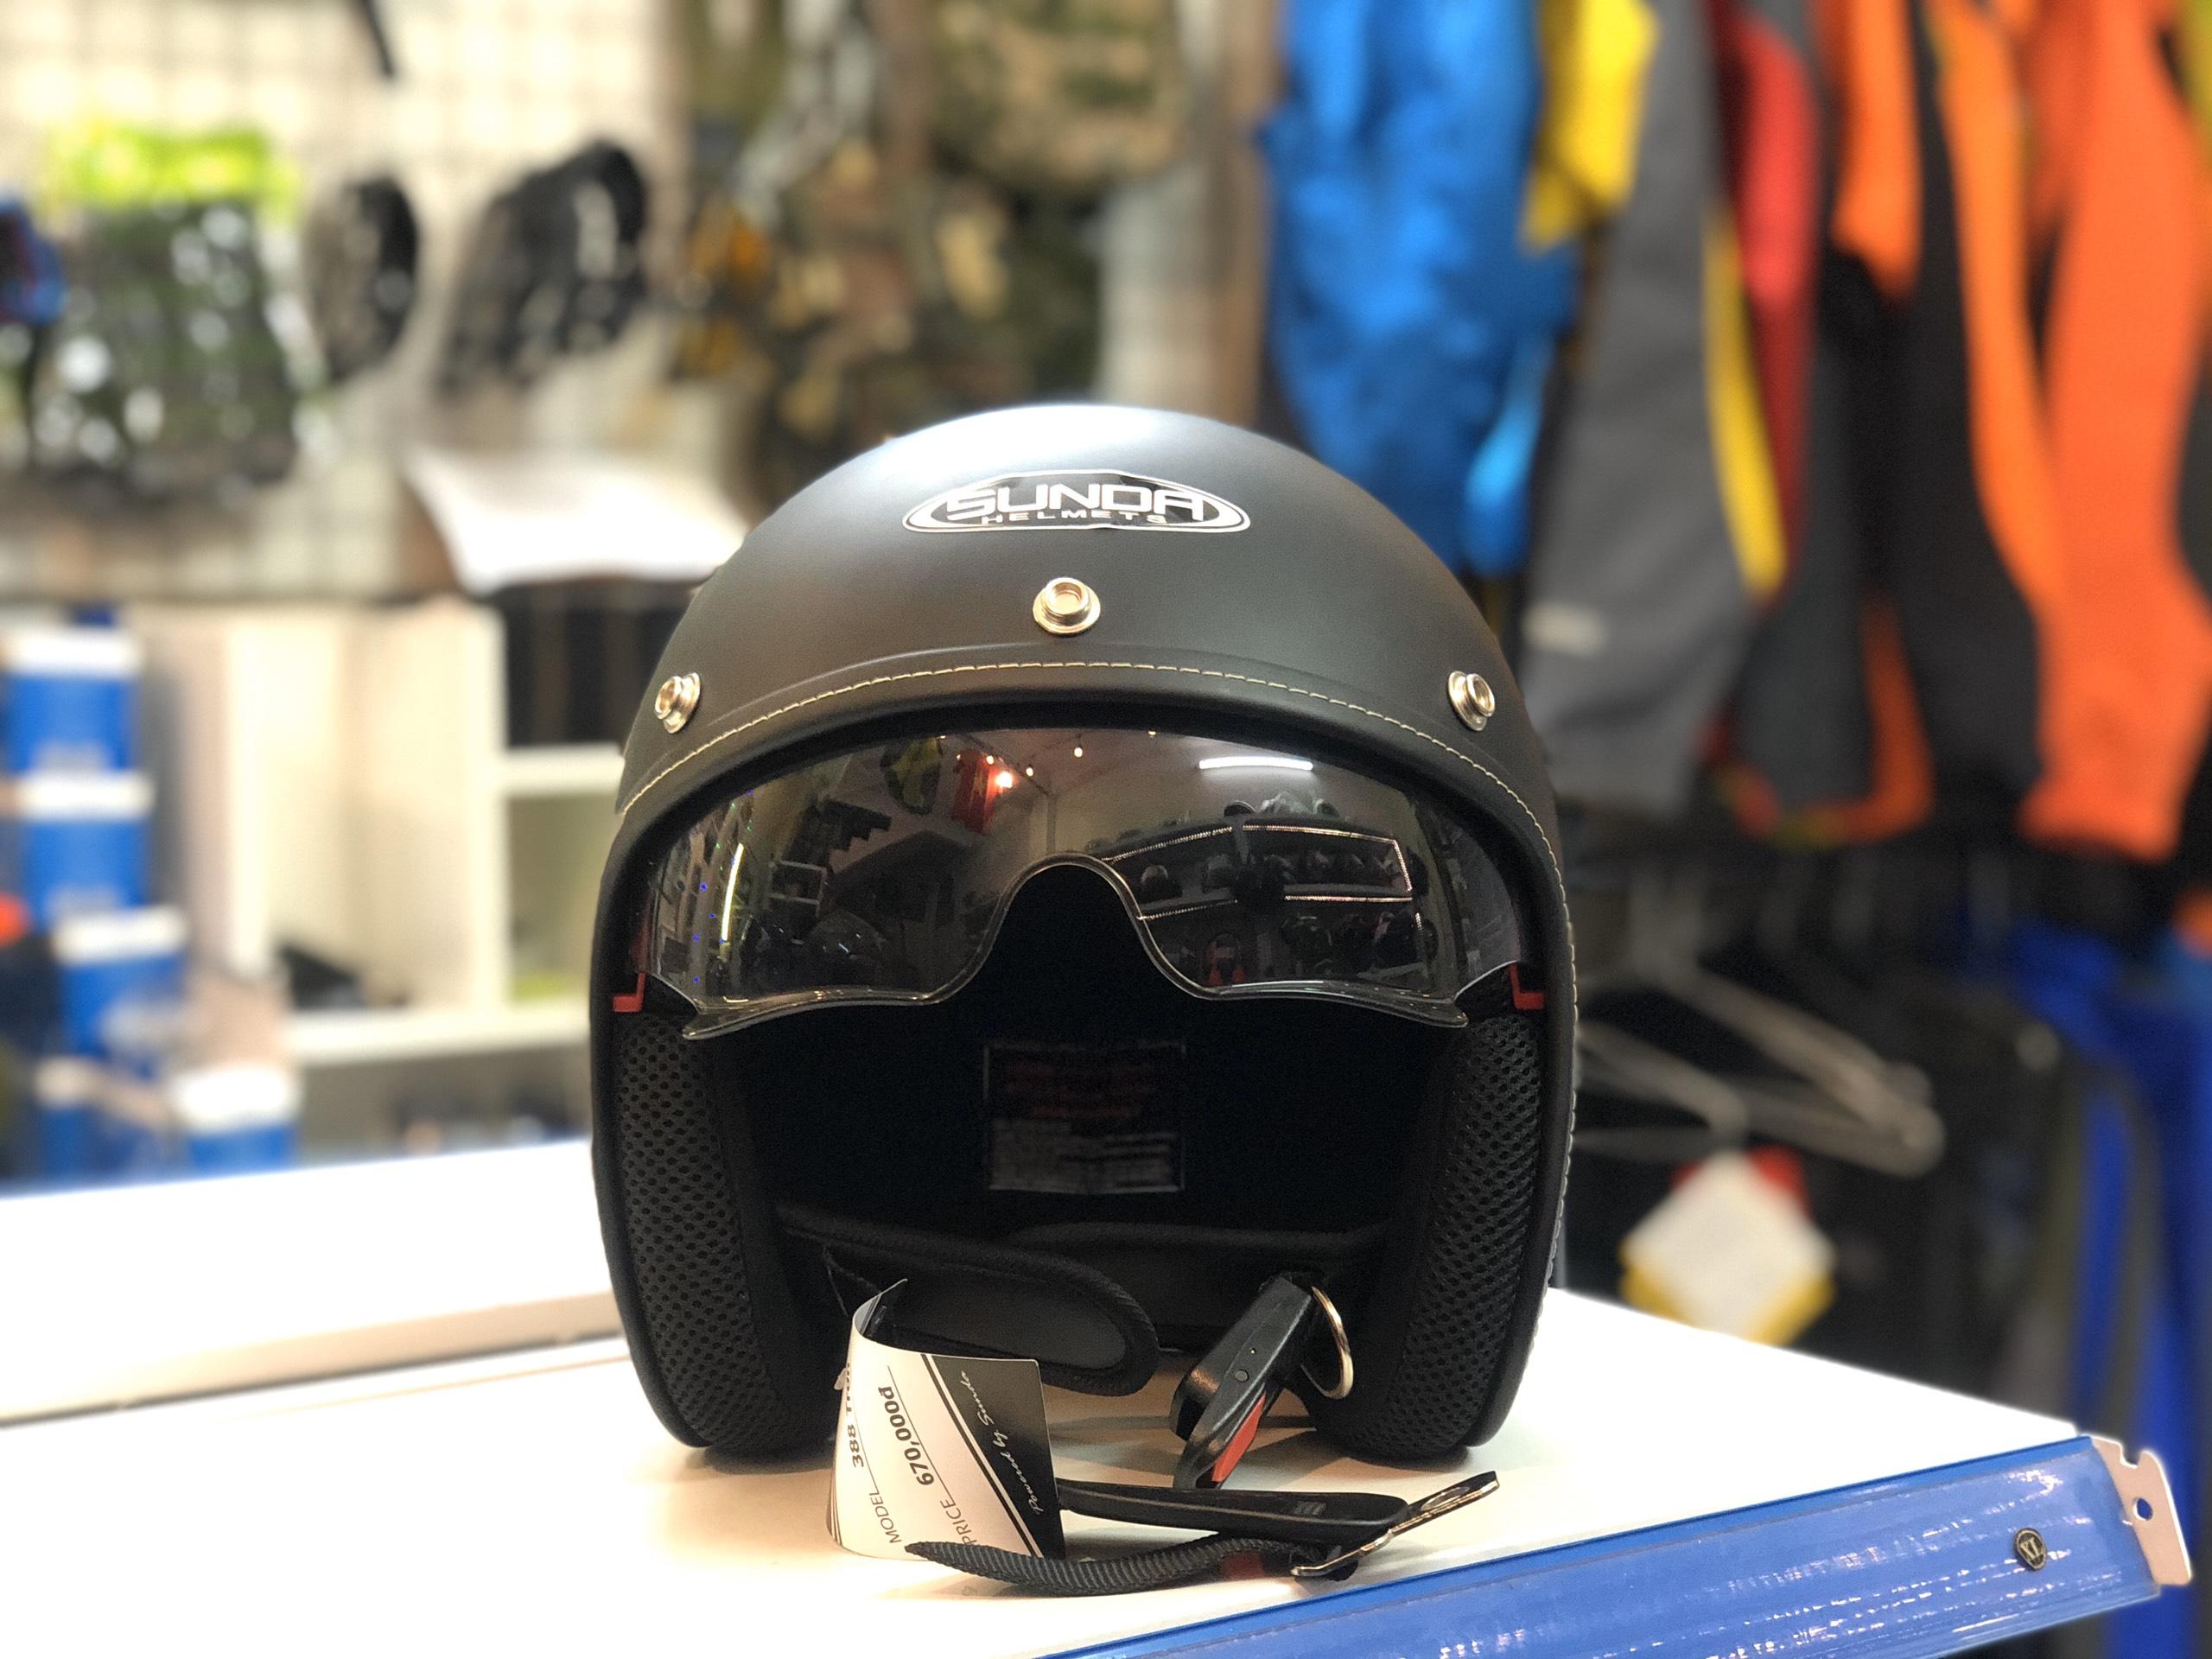 Mũ bảo hiểm sunda 388 (2)